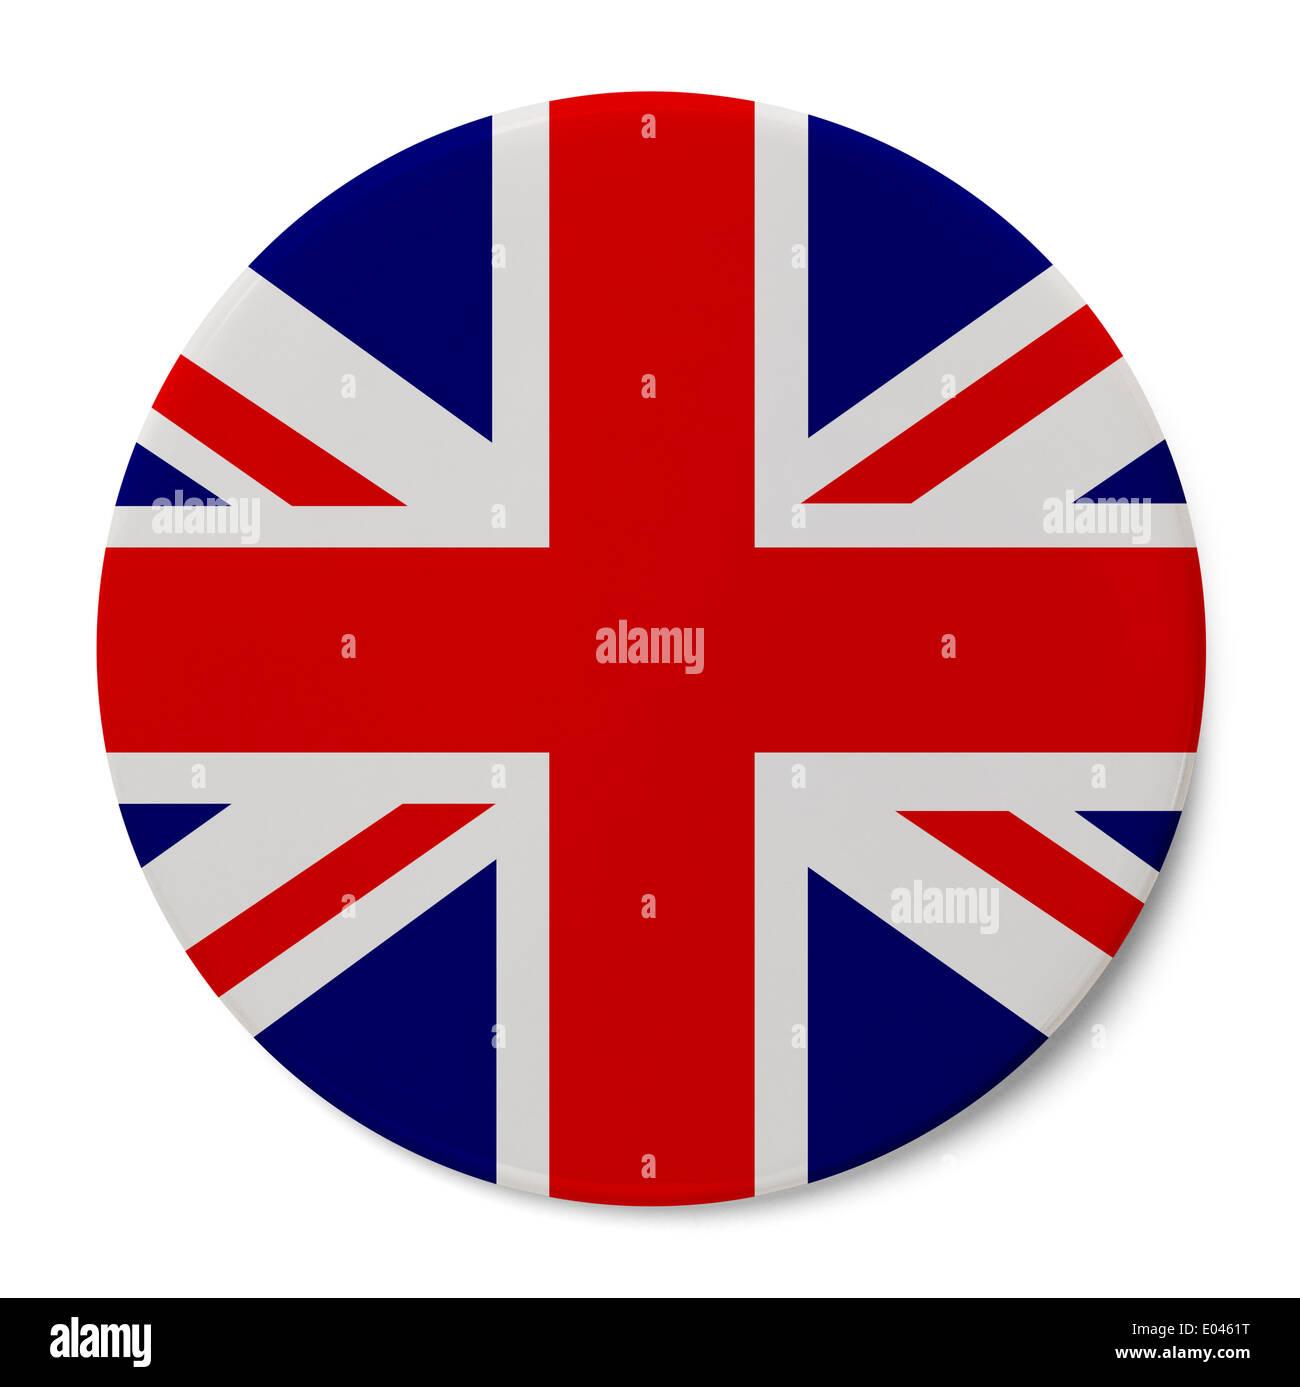 Bandiera Inglese Con Sfondo Rosso Klingedingen